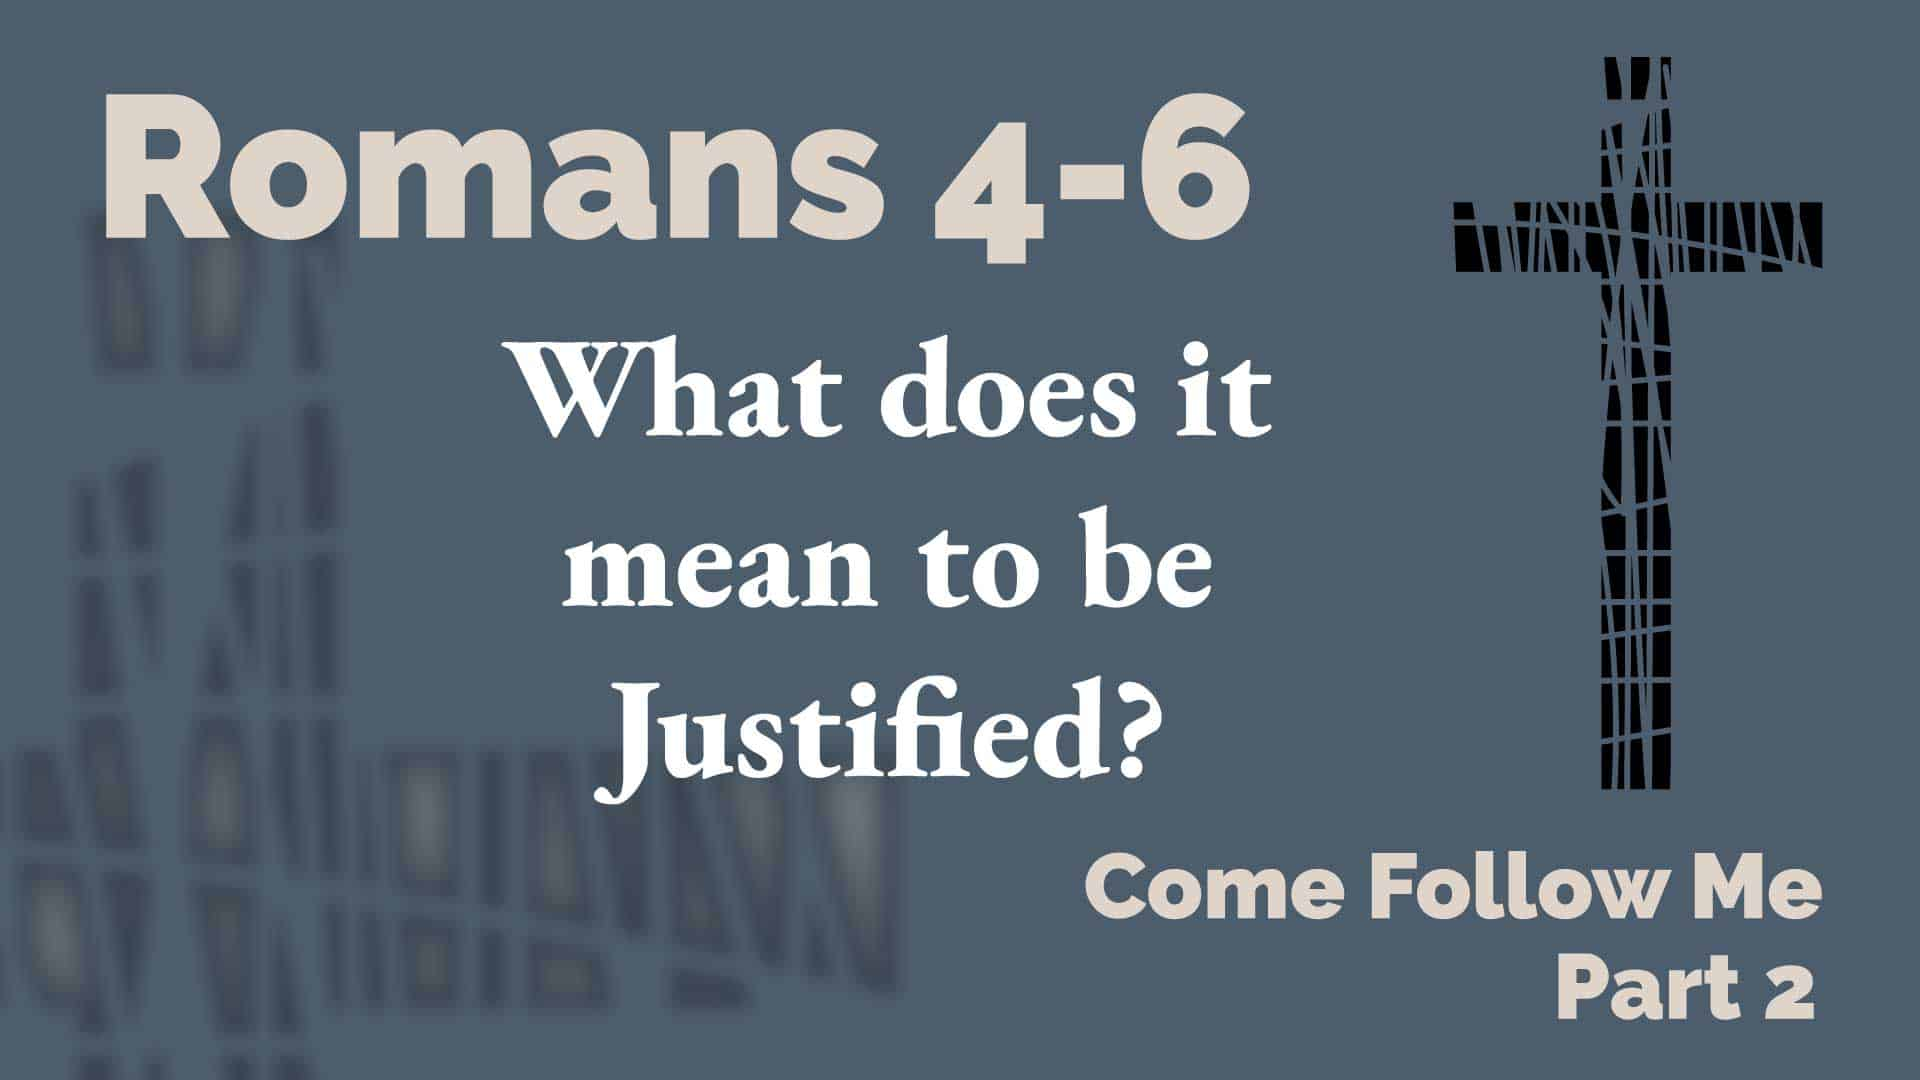 Romans 4-6 - Come Follow Me | Talking to Mormons